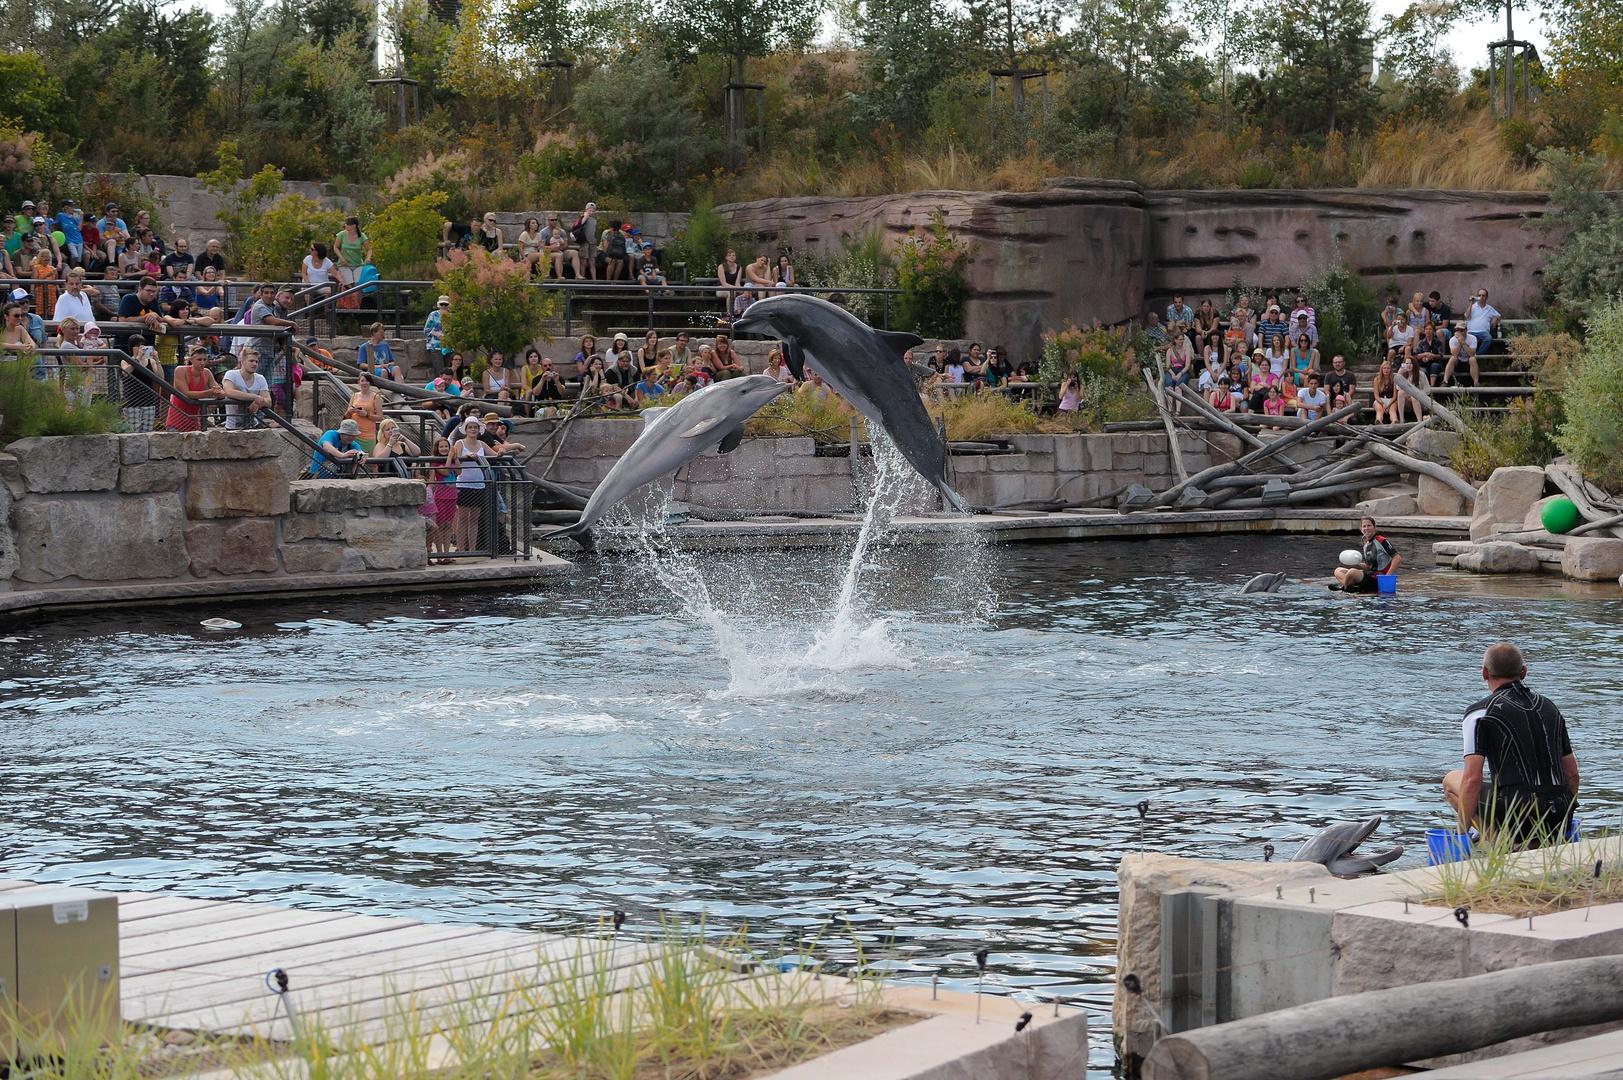 Delfine in Aktion